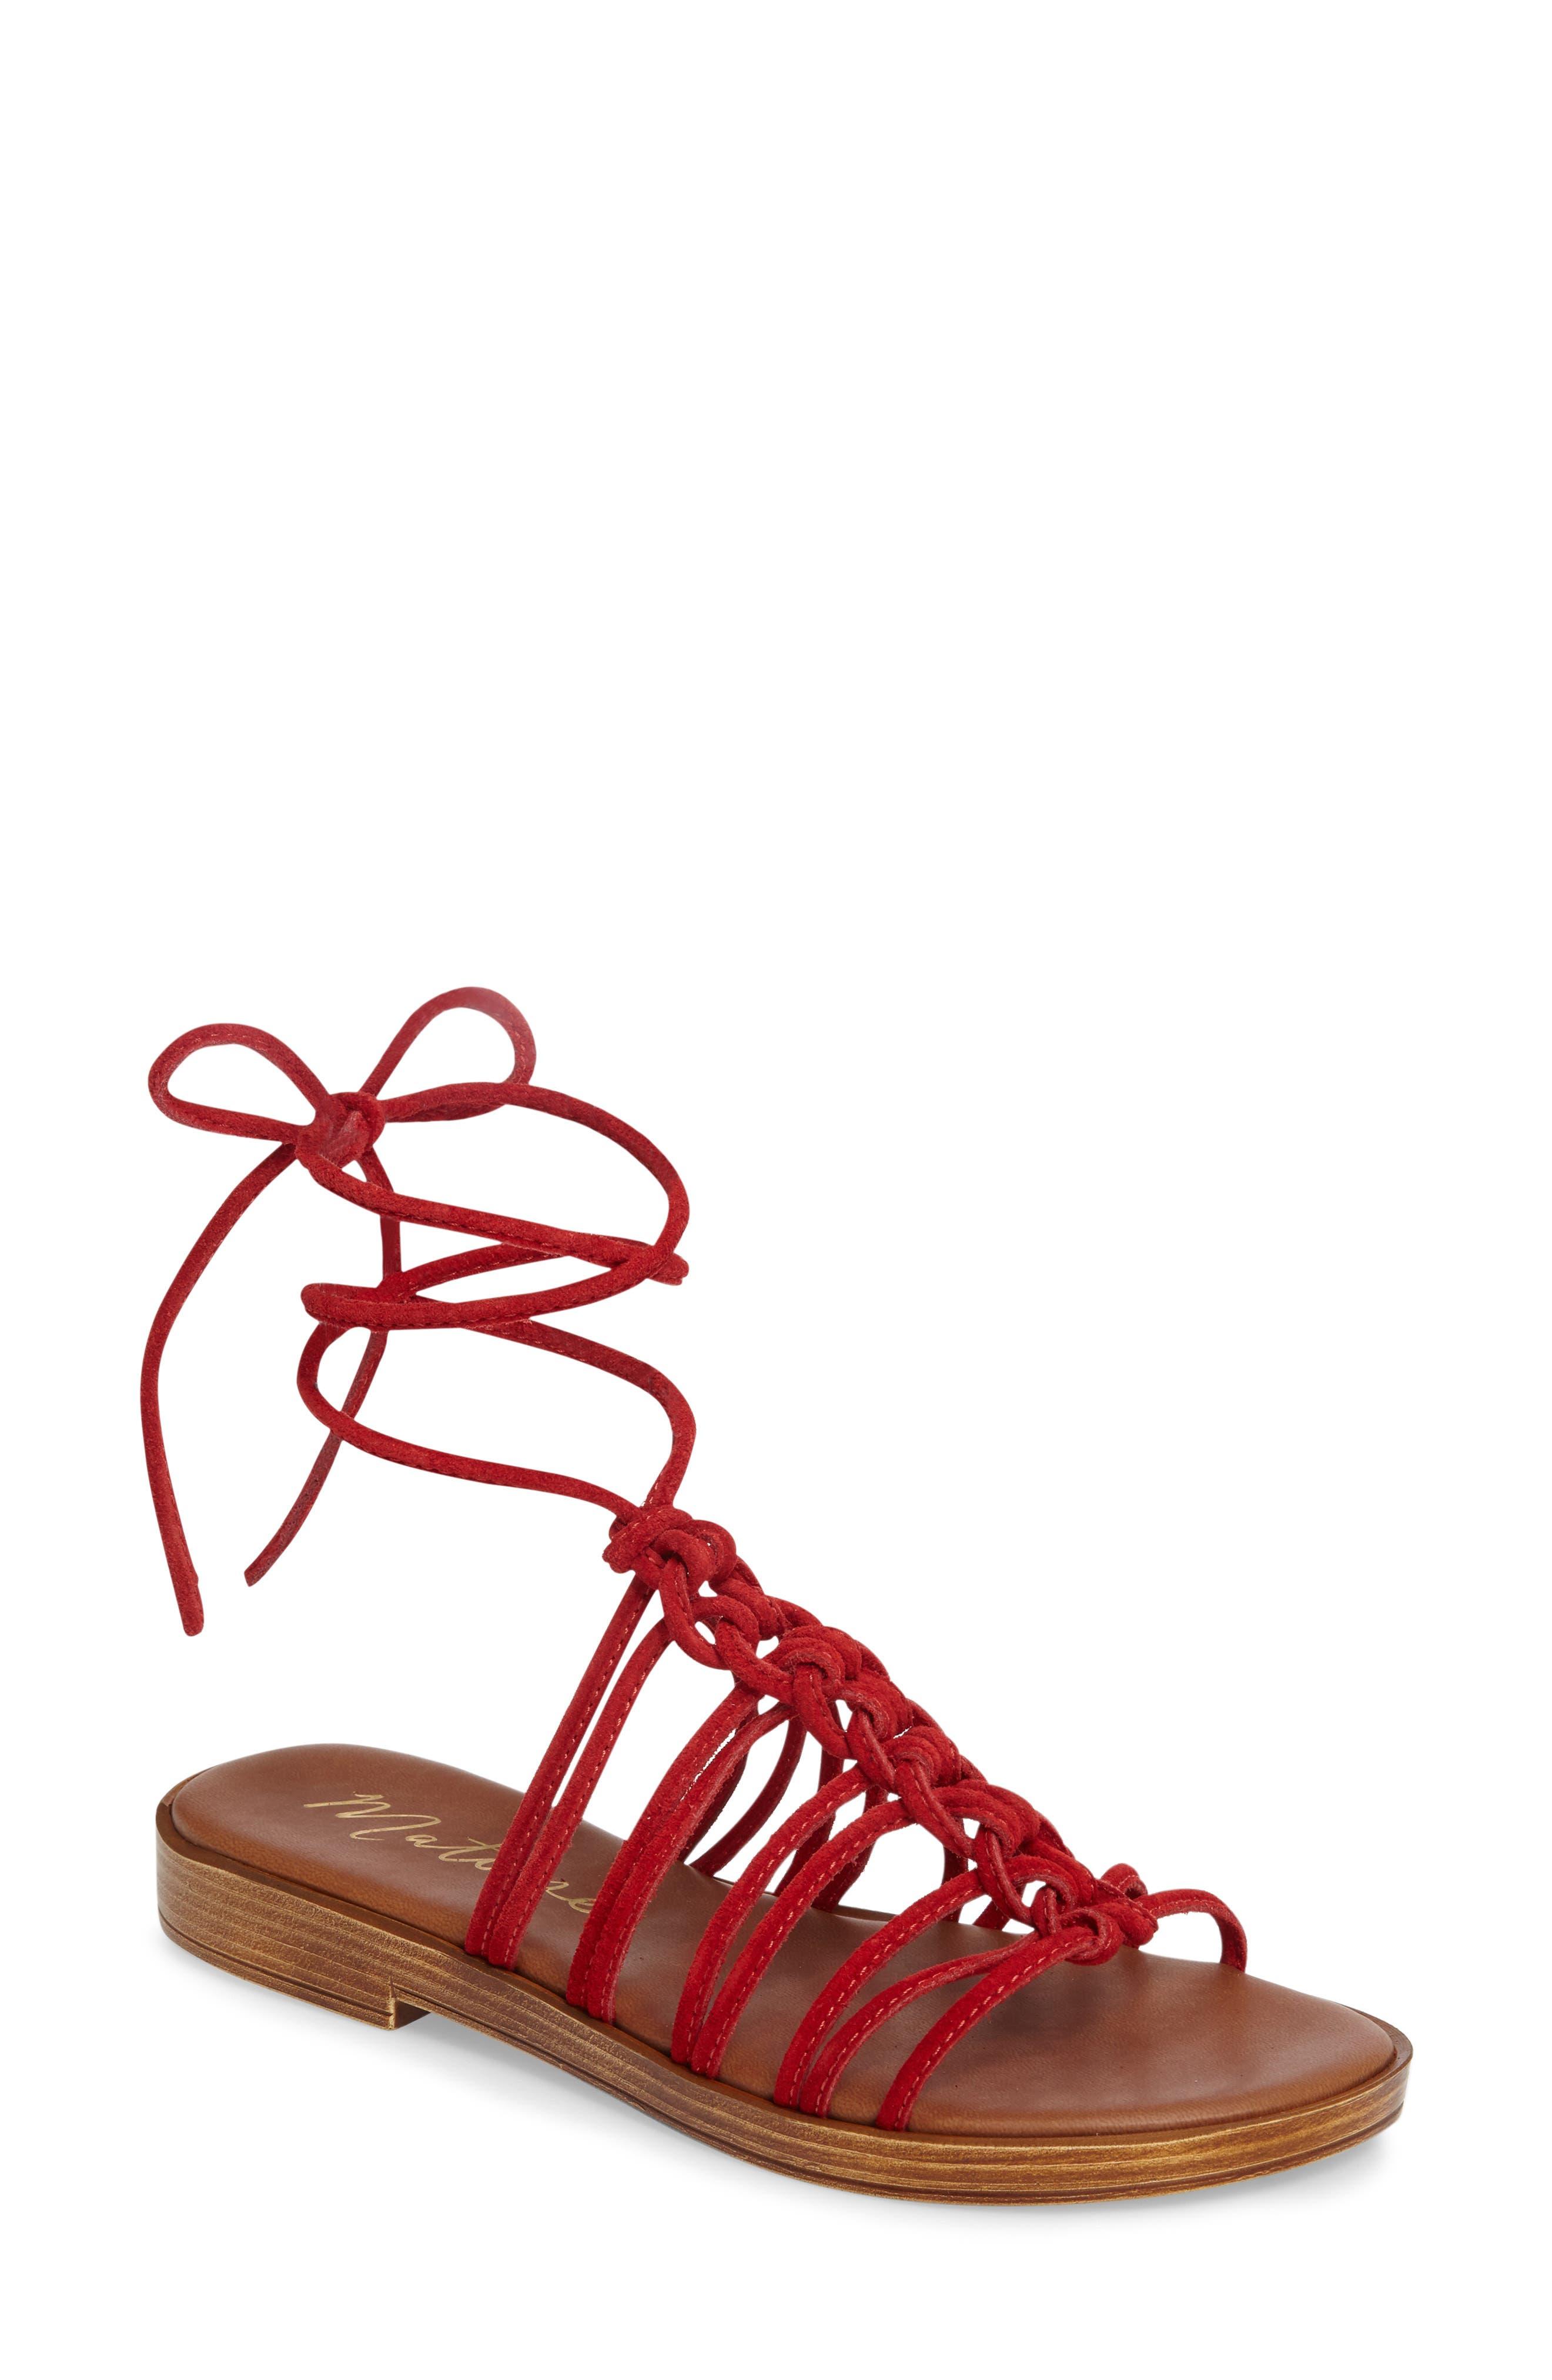 Origin Lace-Up Sandal,                             Main thumbnail 1, color,                             Red Suede